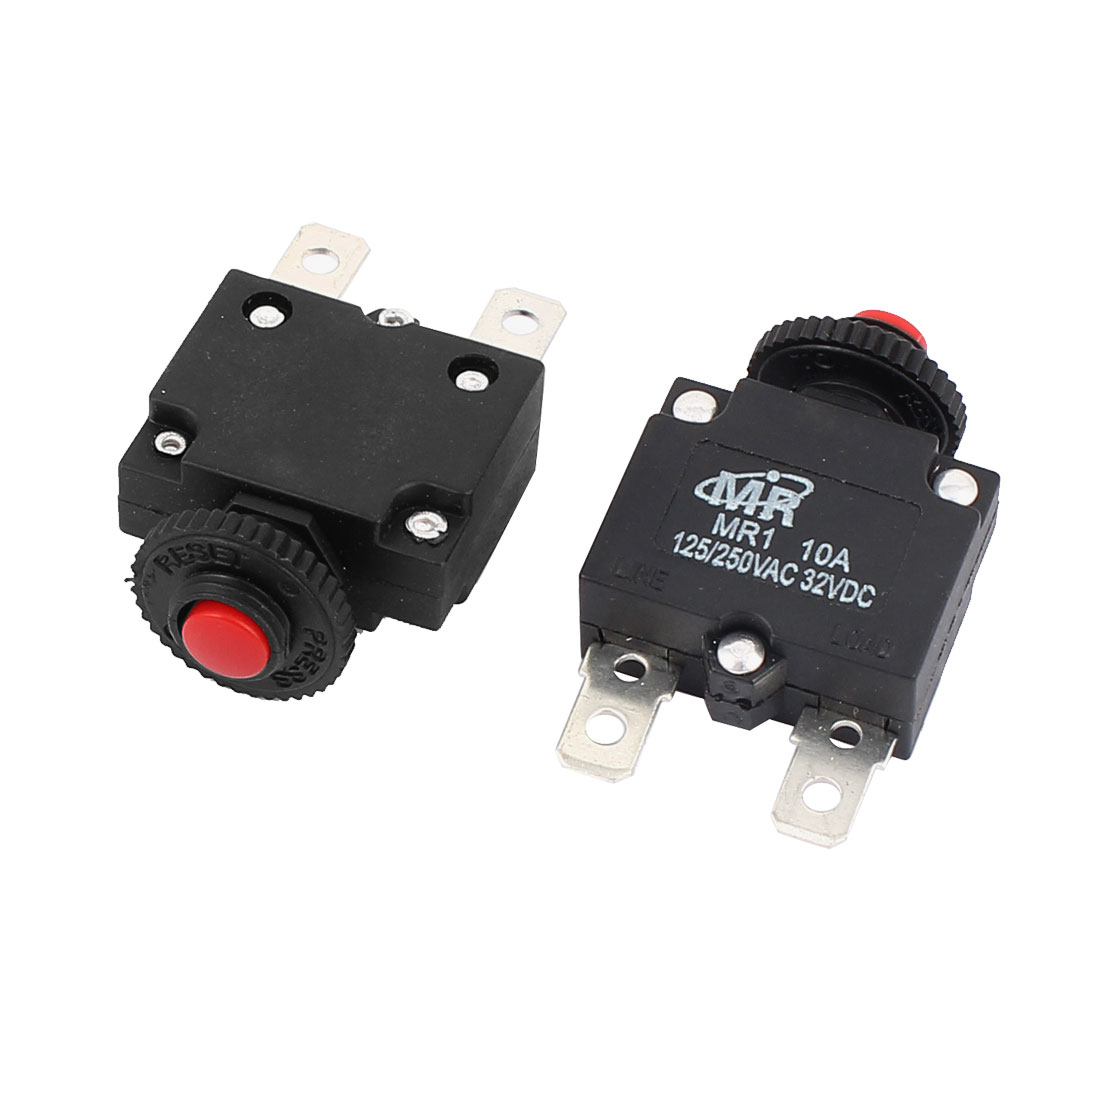 Unique Bargains  125V/250V 10A Red Reset Button Overload Protector Circuit Breaker 2Pcs